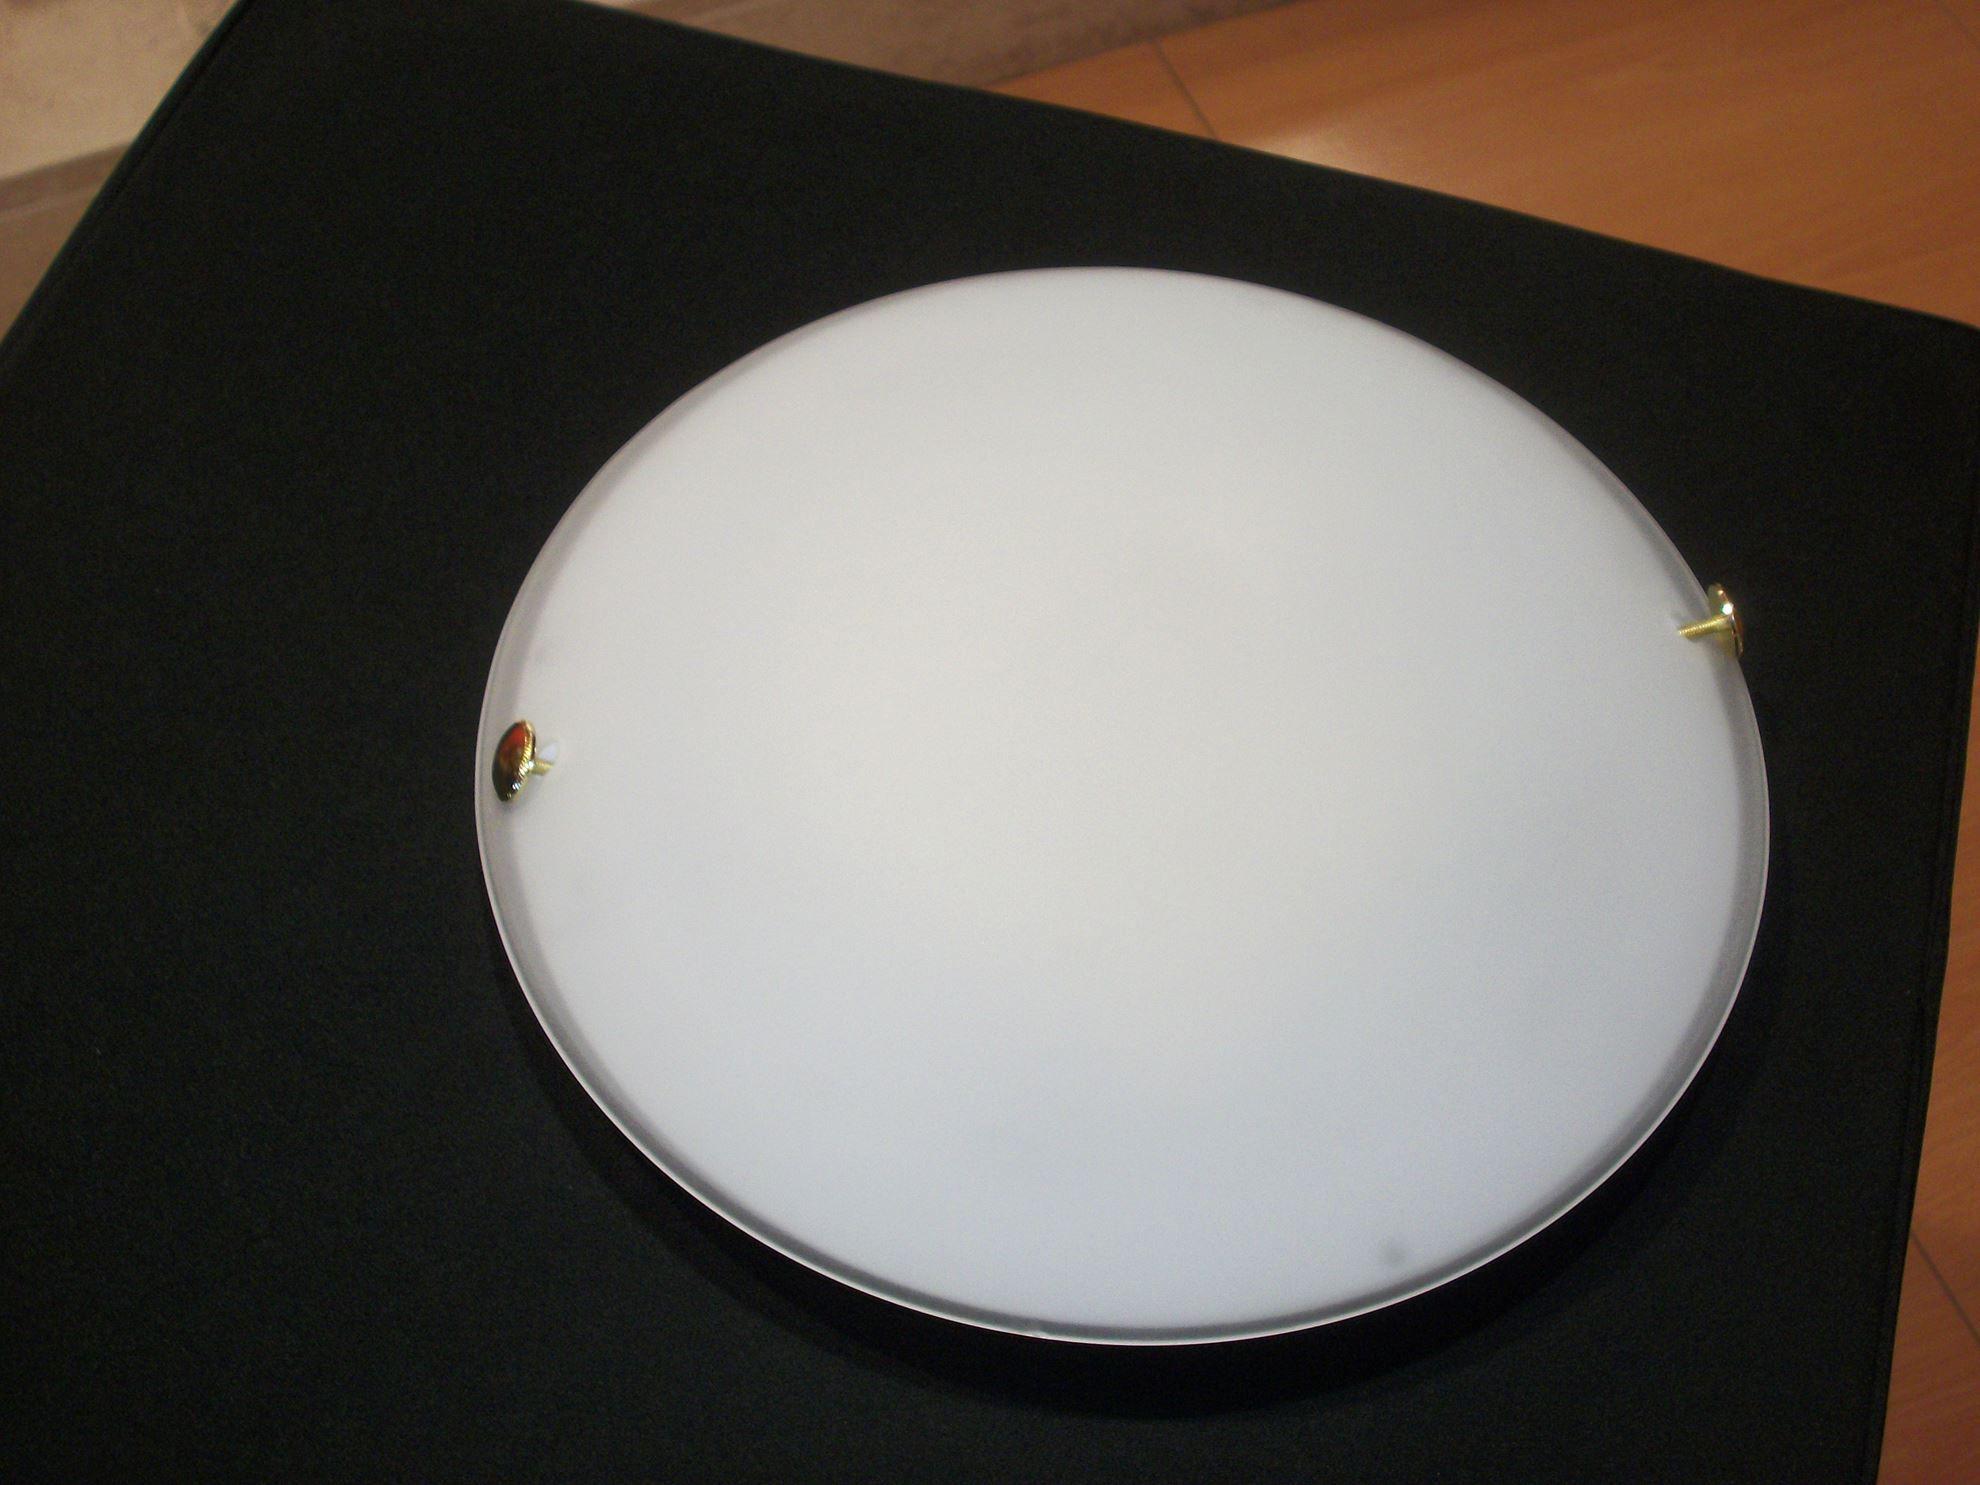 Plafoniere Vetro : Prolight  plafoniera quadrata vetro led w metallo